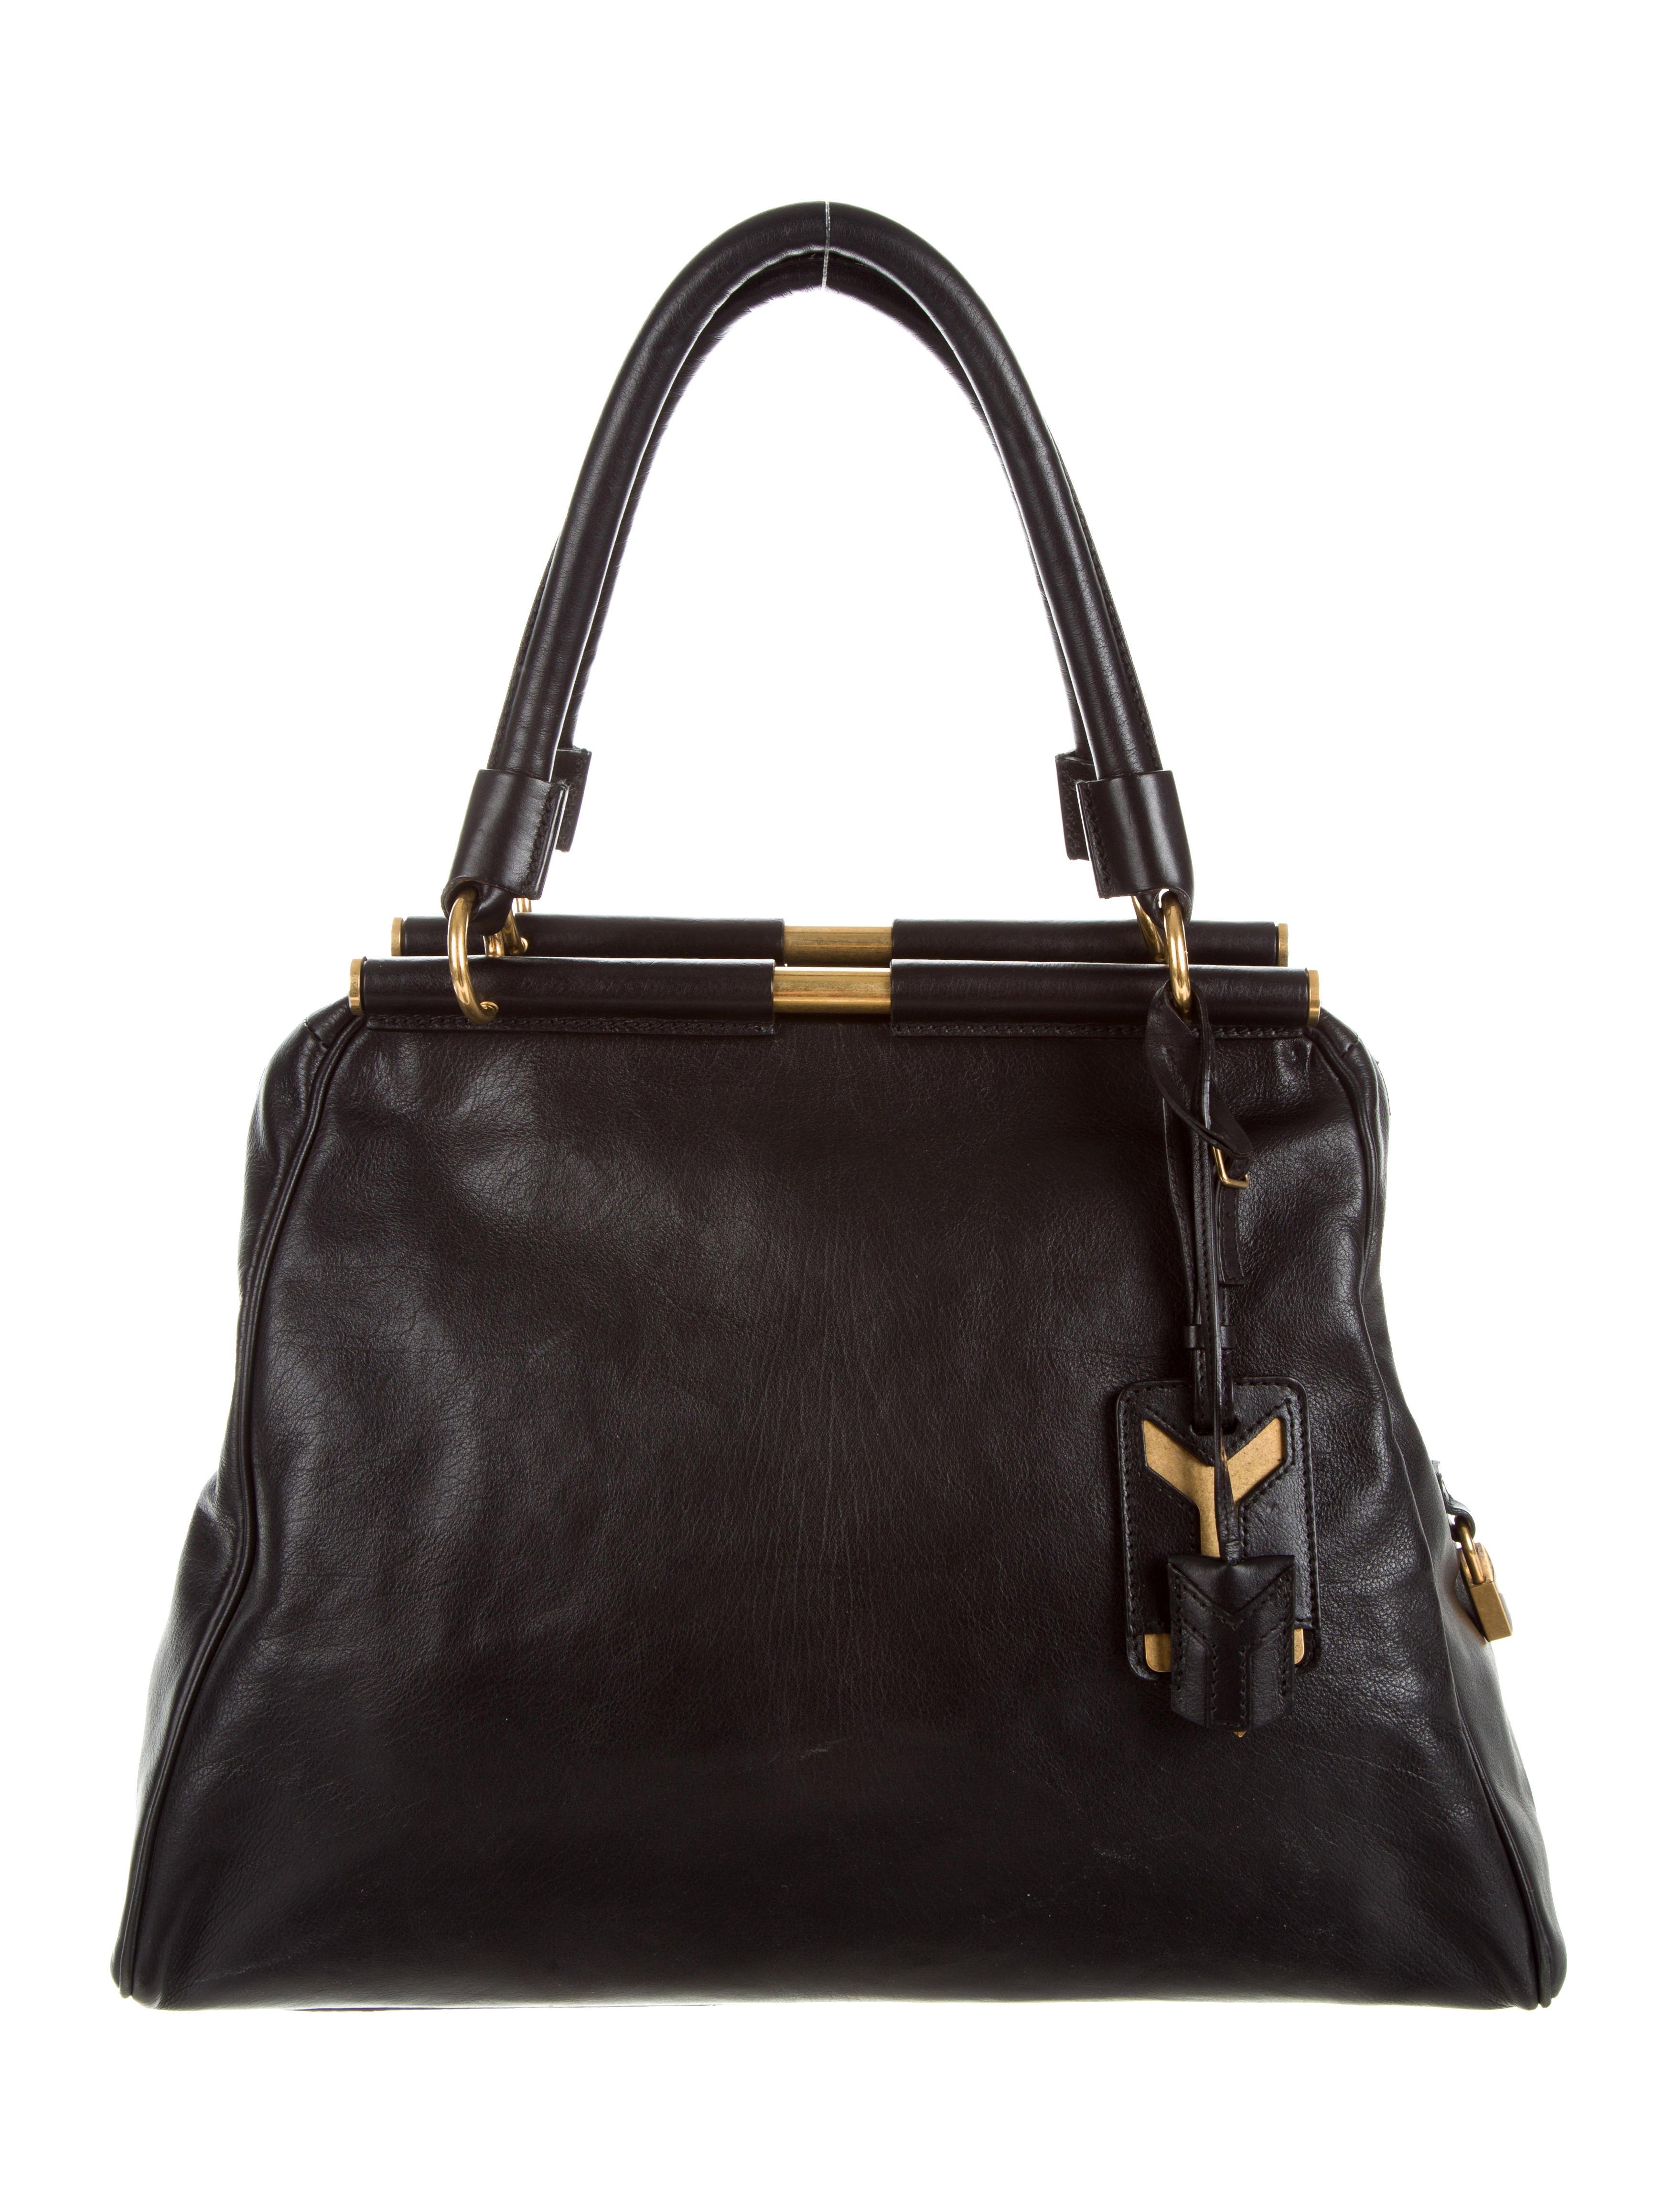 2b4bcc319b2e Yves Saint Laurent Majorelle Leather Bag - Handbags .